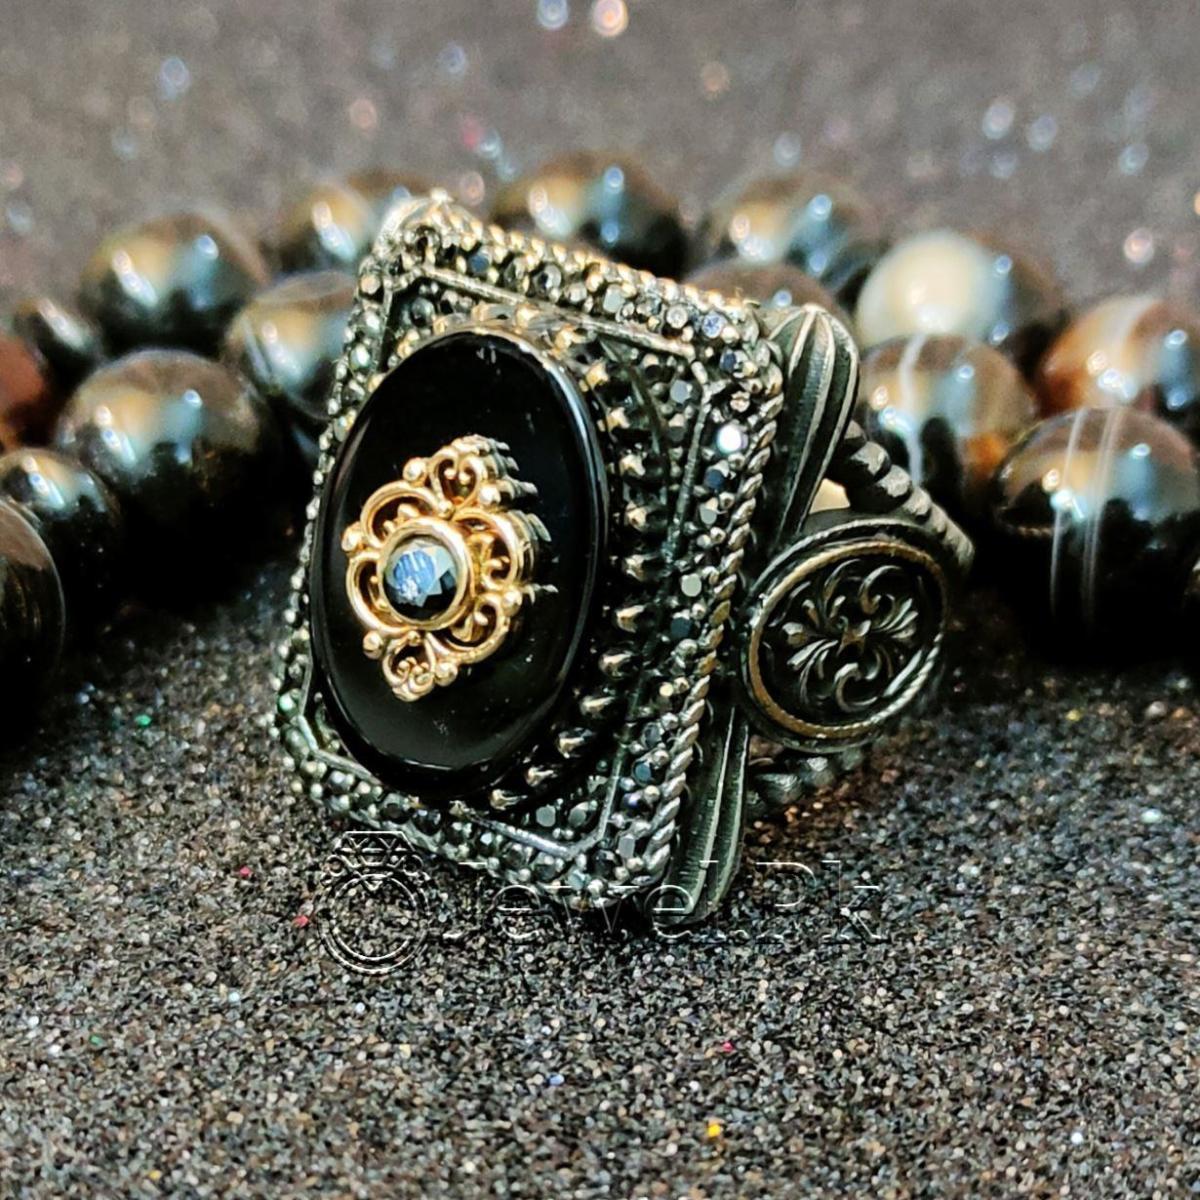 Turkish Rings 925 Silver Handmade Chandi Ring Turkey Imported 1 natural gemstones pakistan + 925 silver jewelry online